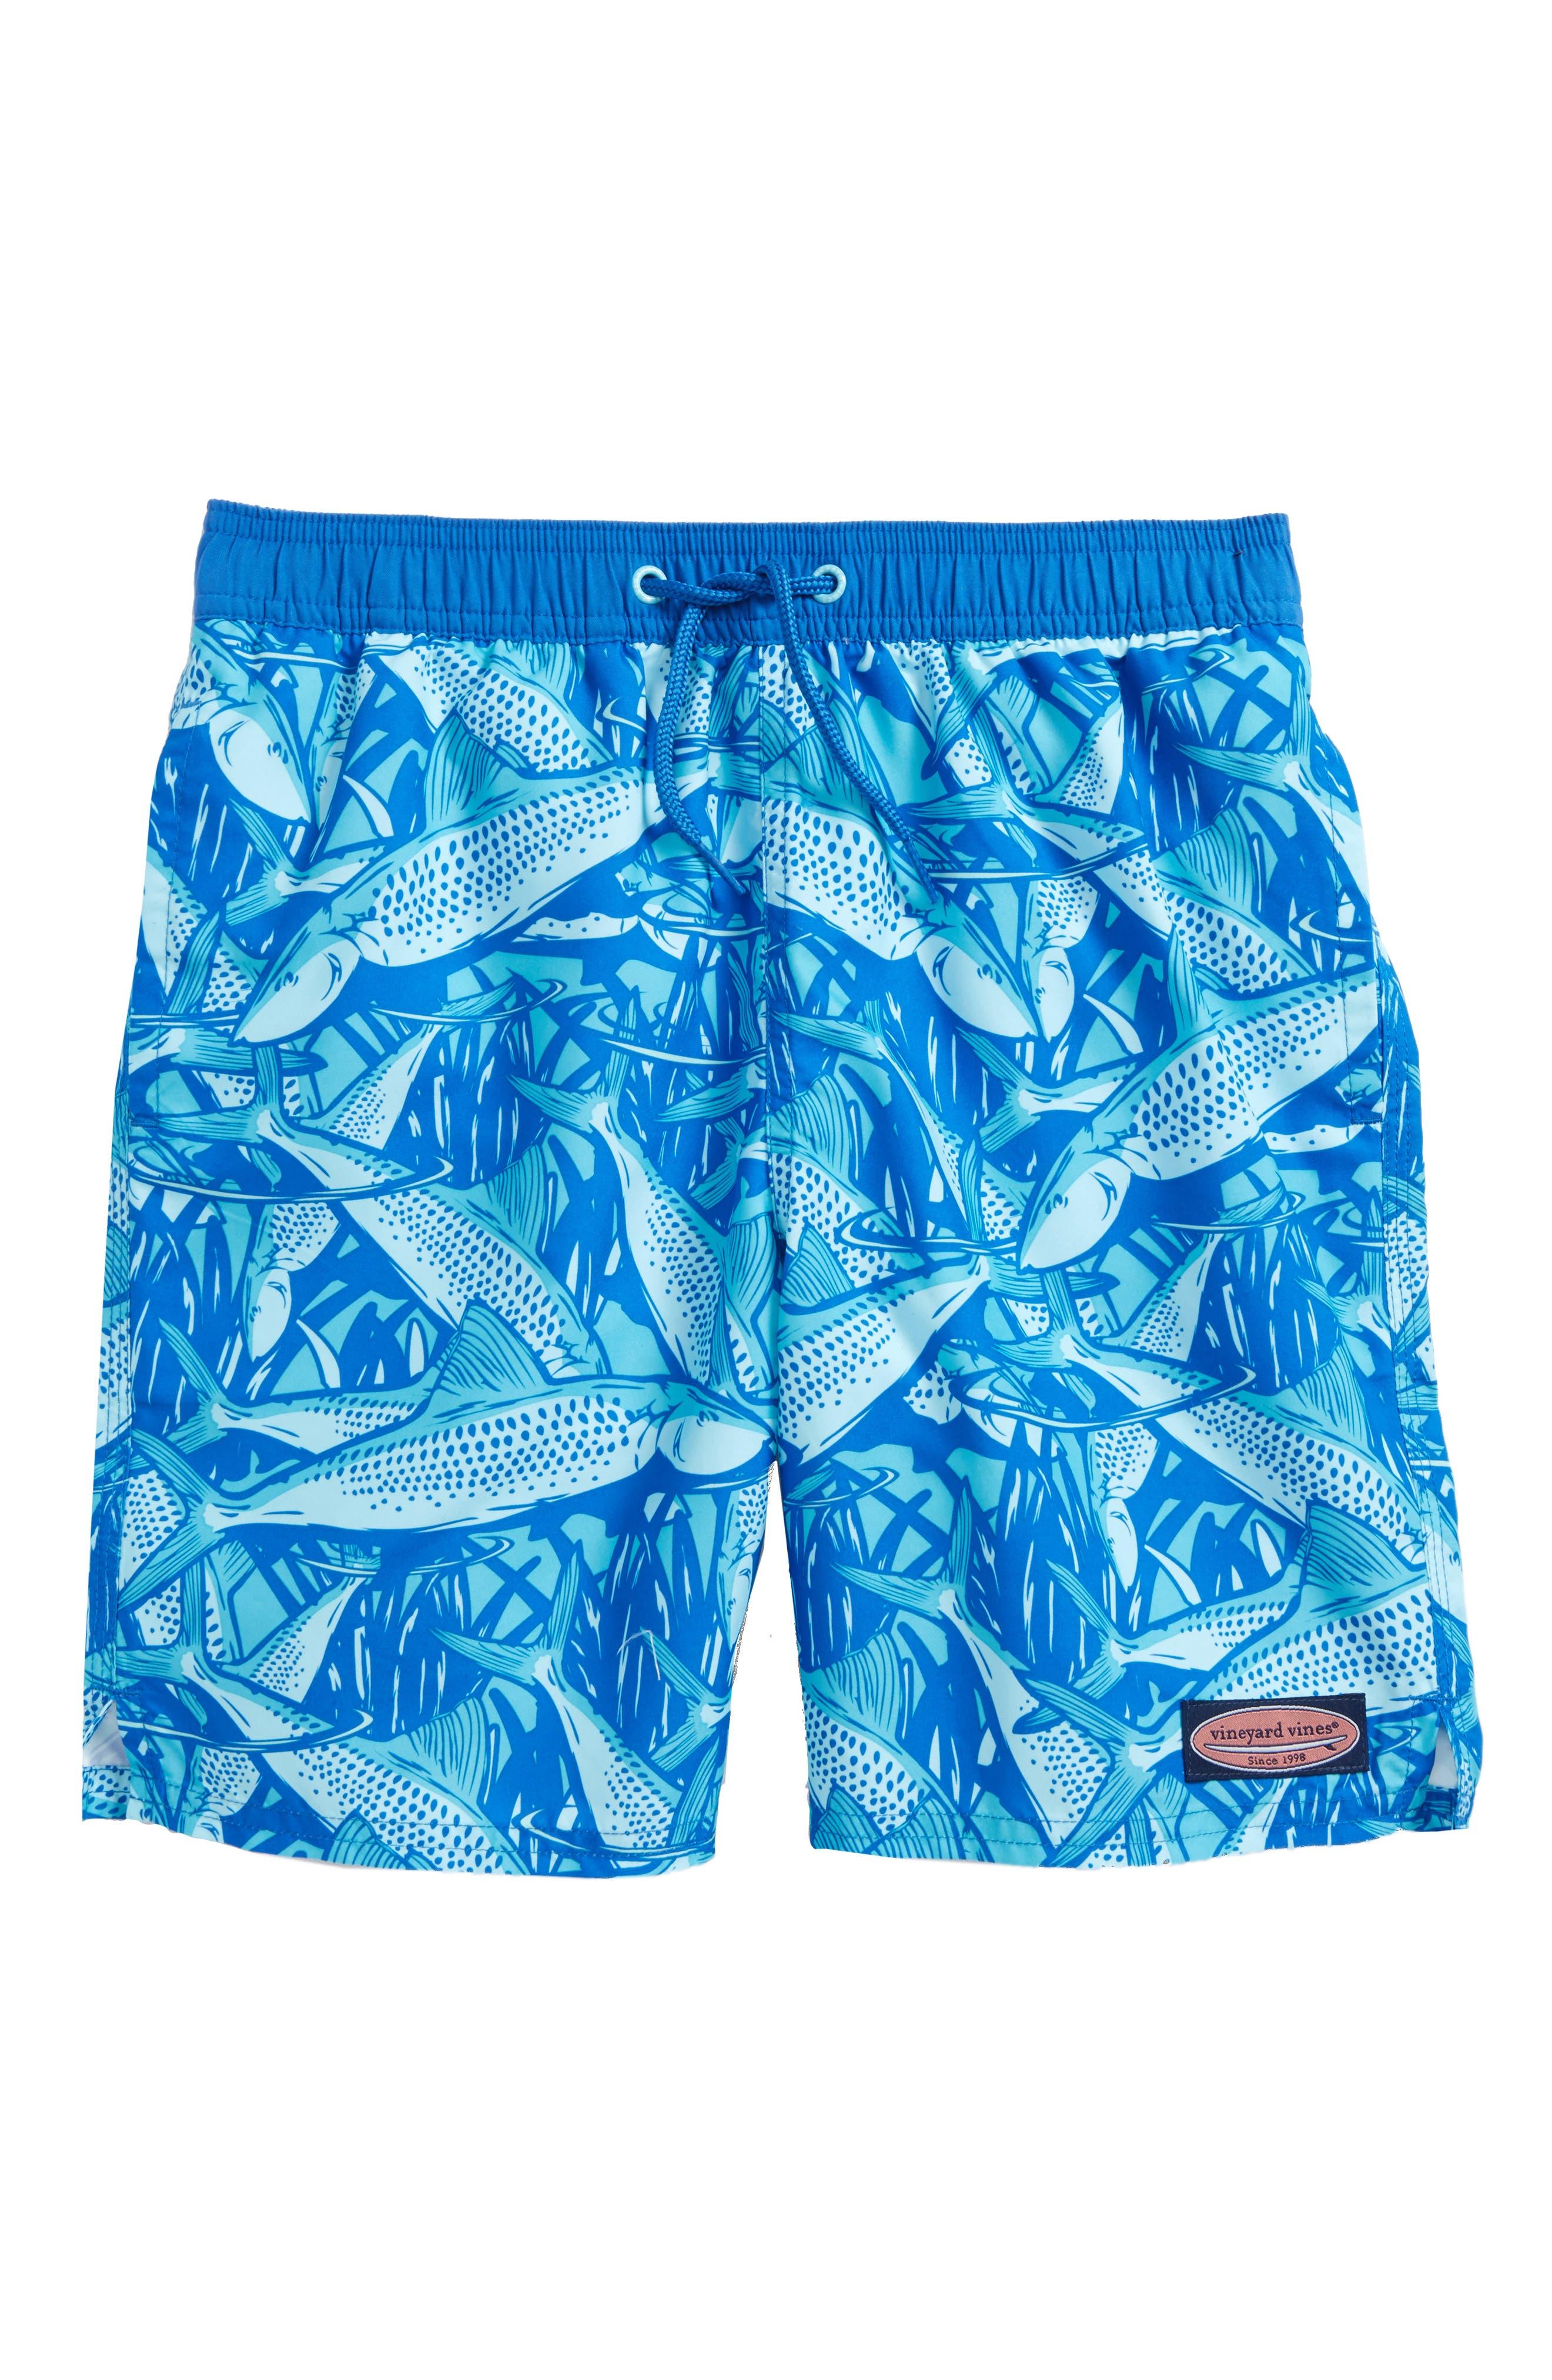 Chappy Bonefish Swim Trunks,                         Main,                         color, 440